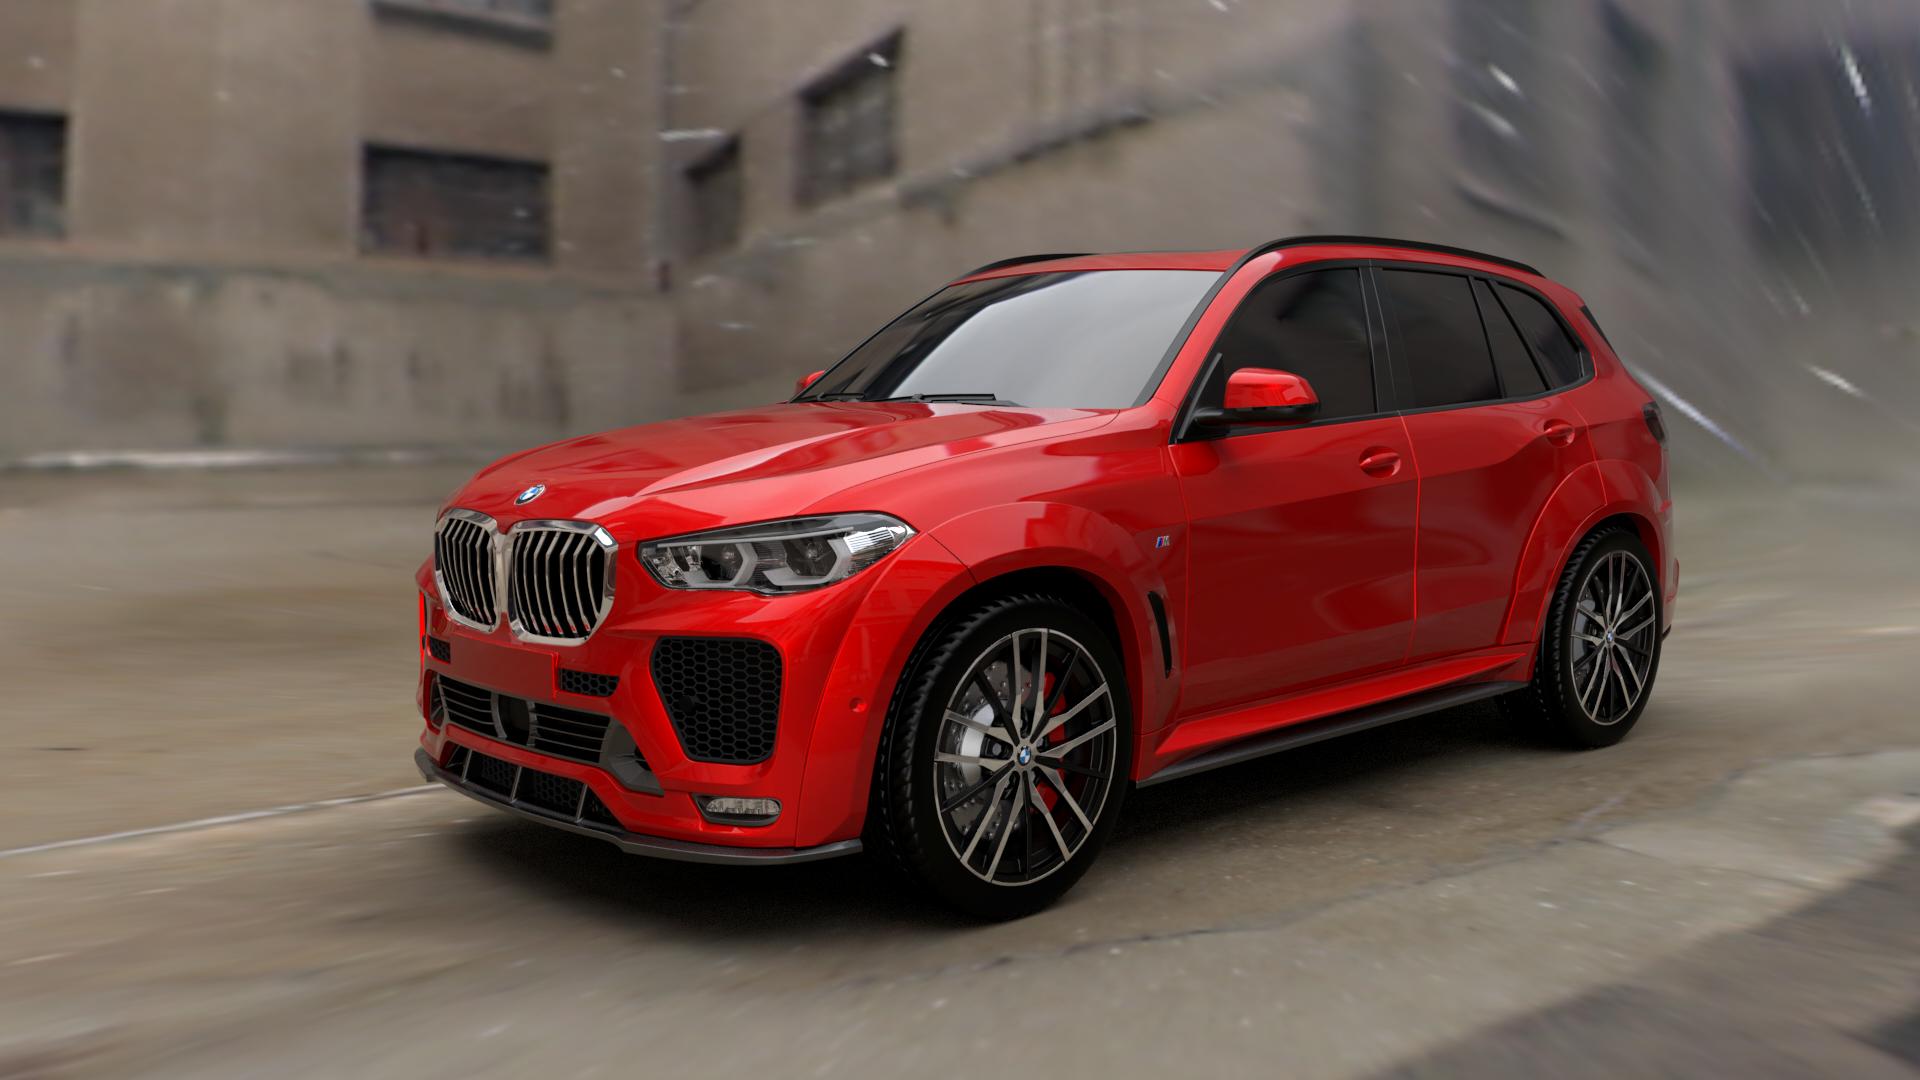 Renegade body kit for BMW X5 G05 latest model